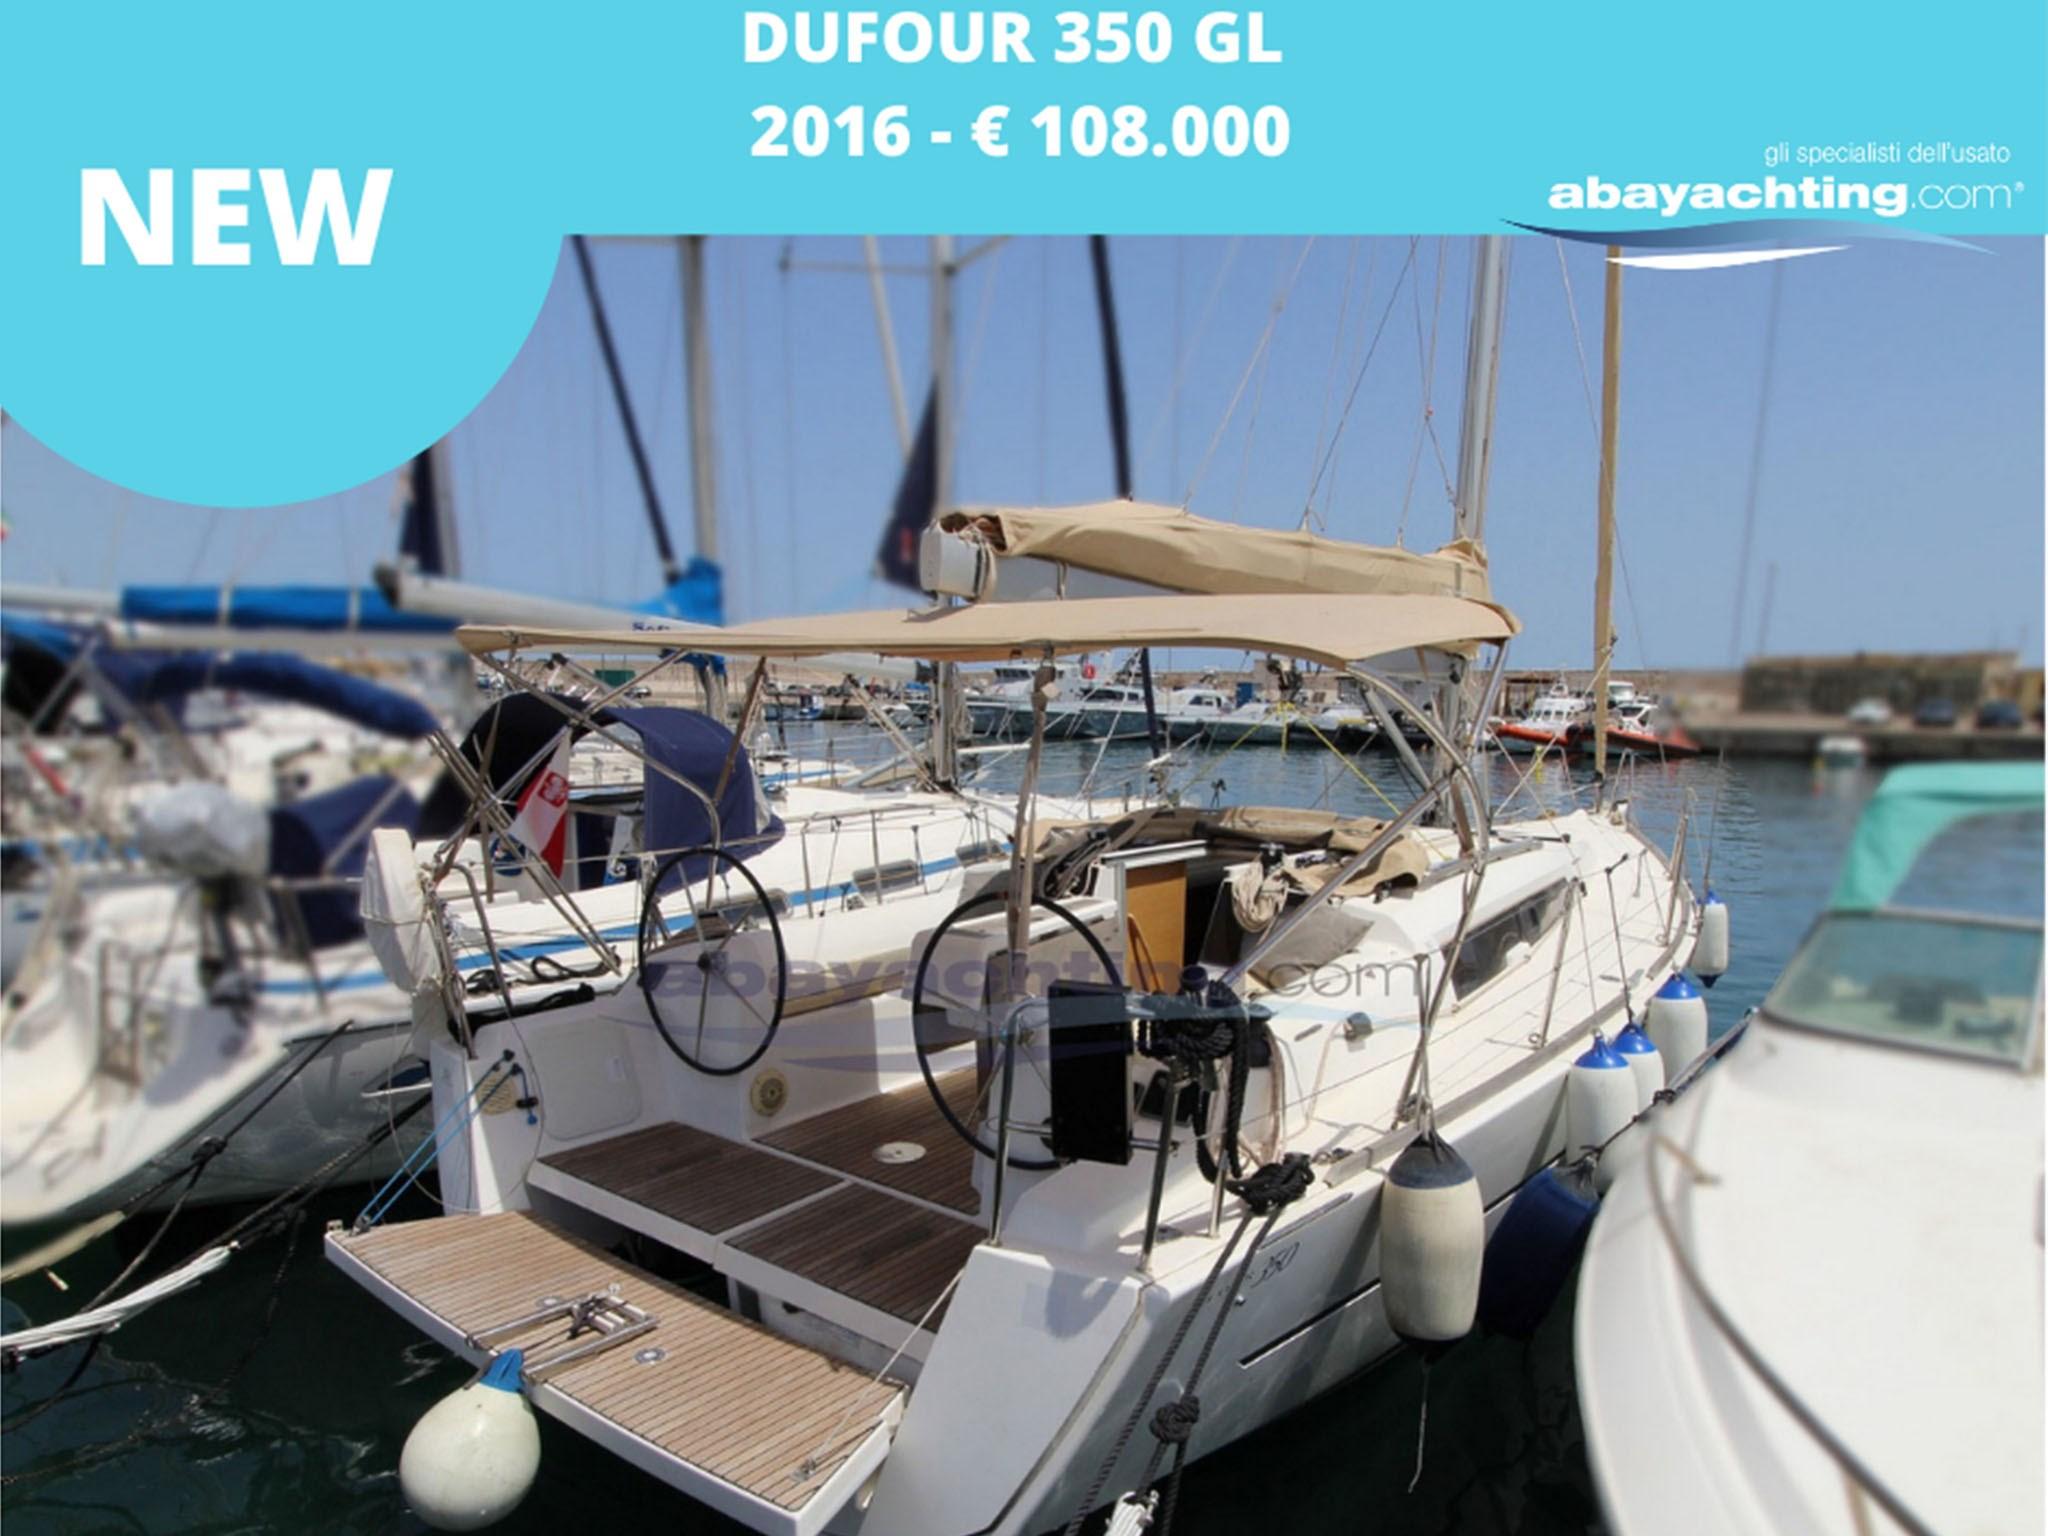 Nuovo arrivo Dufour 350 GL